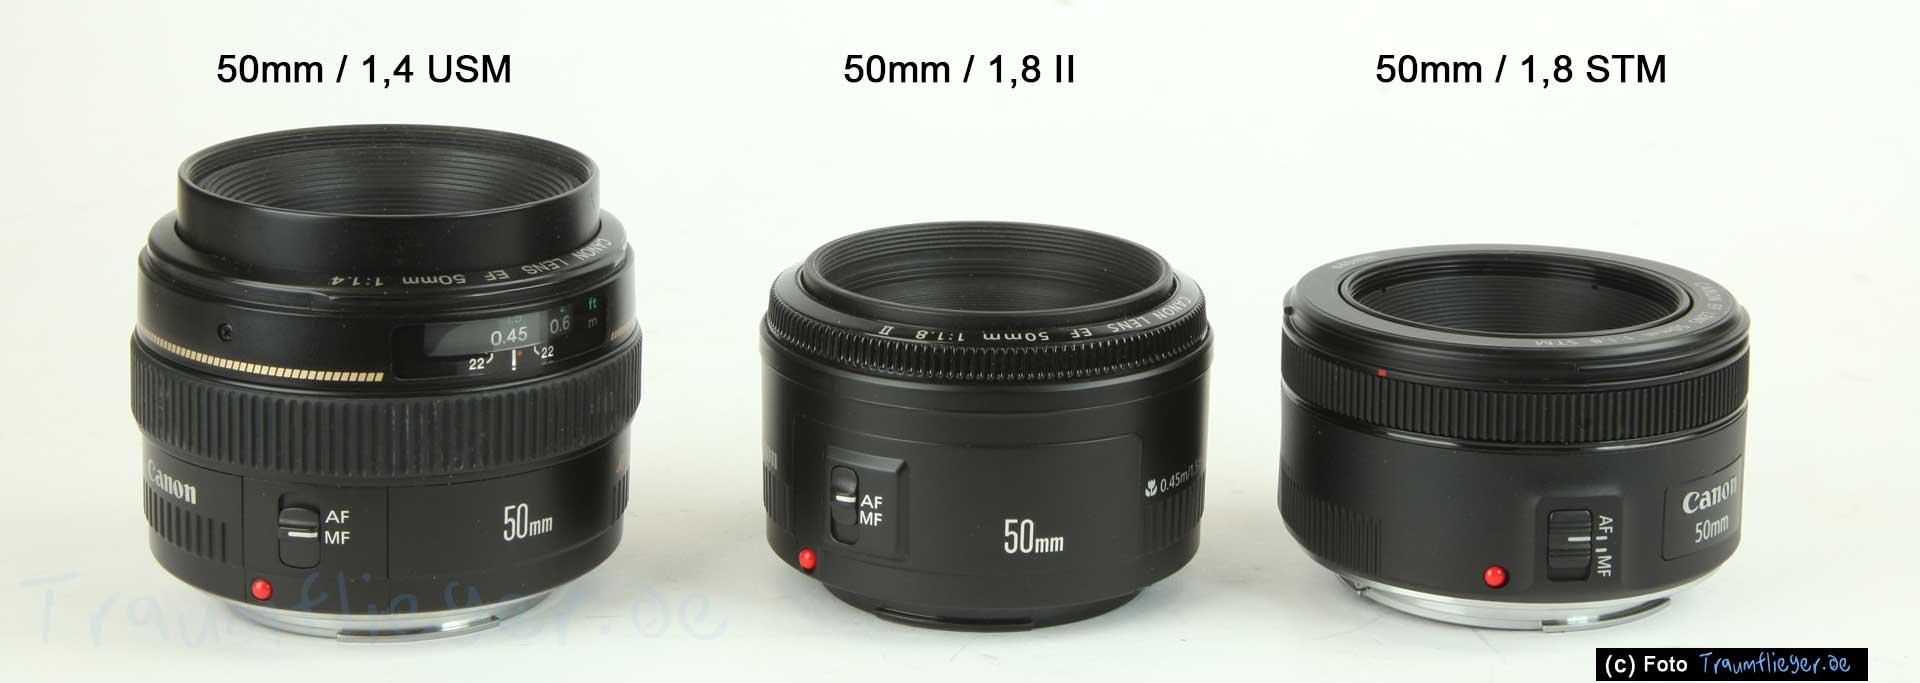 Canon 50mm / 1,8 STM im Test - Traumflieger.de